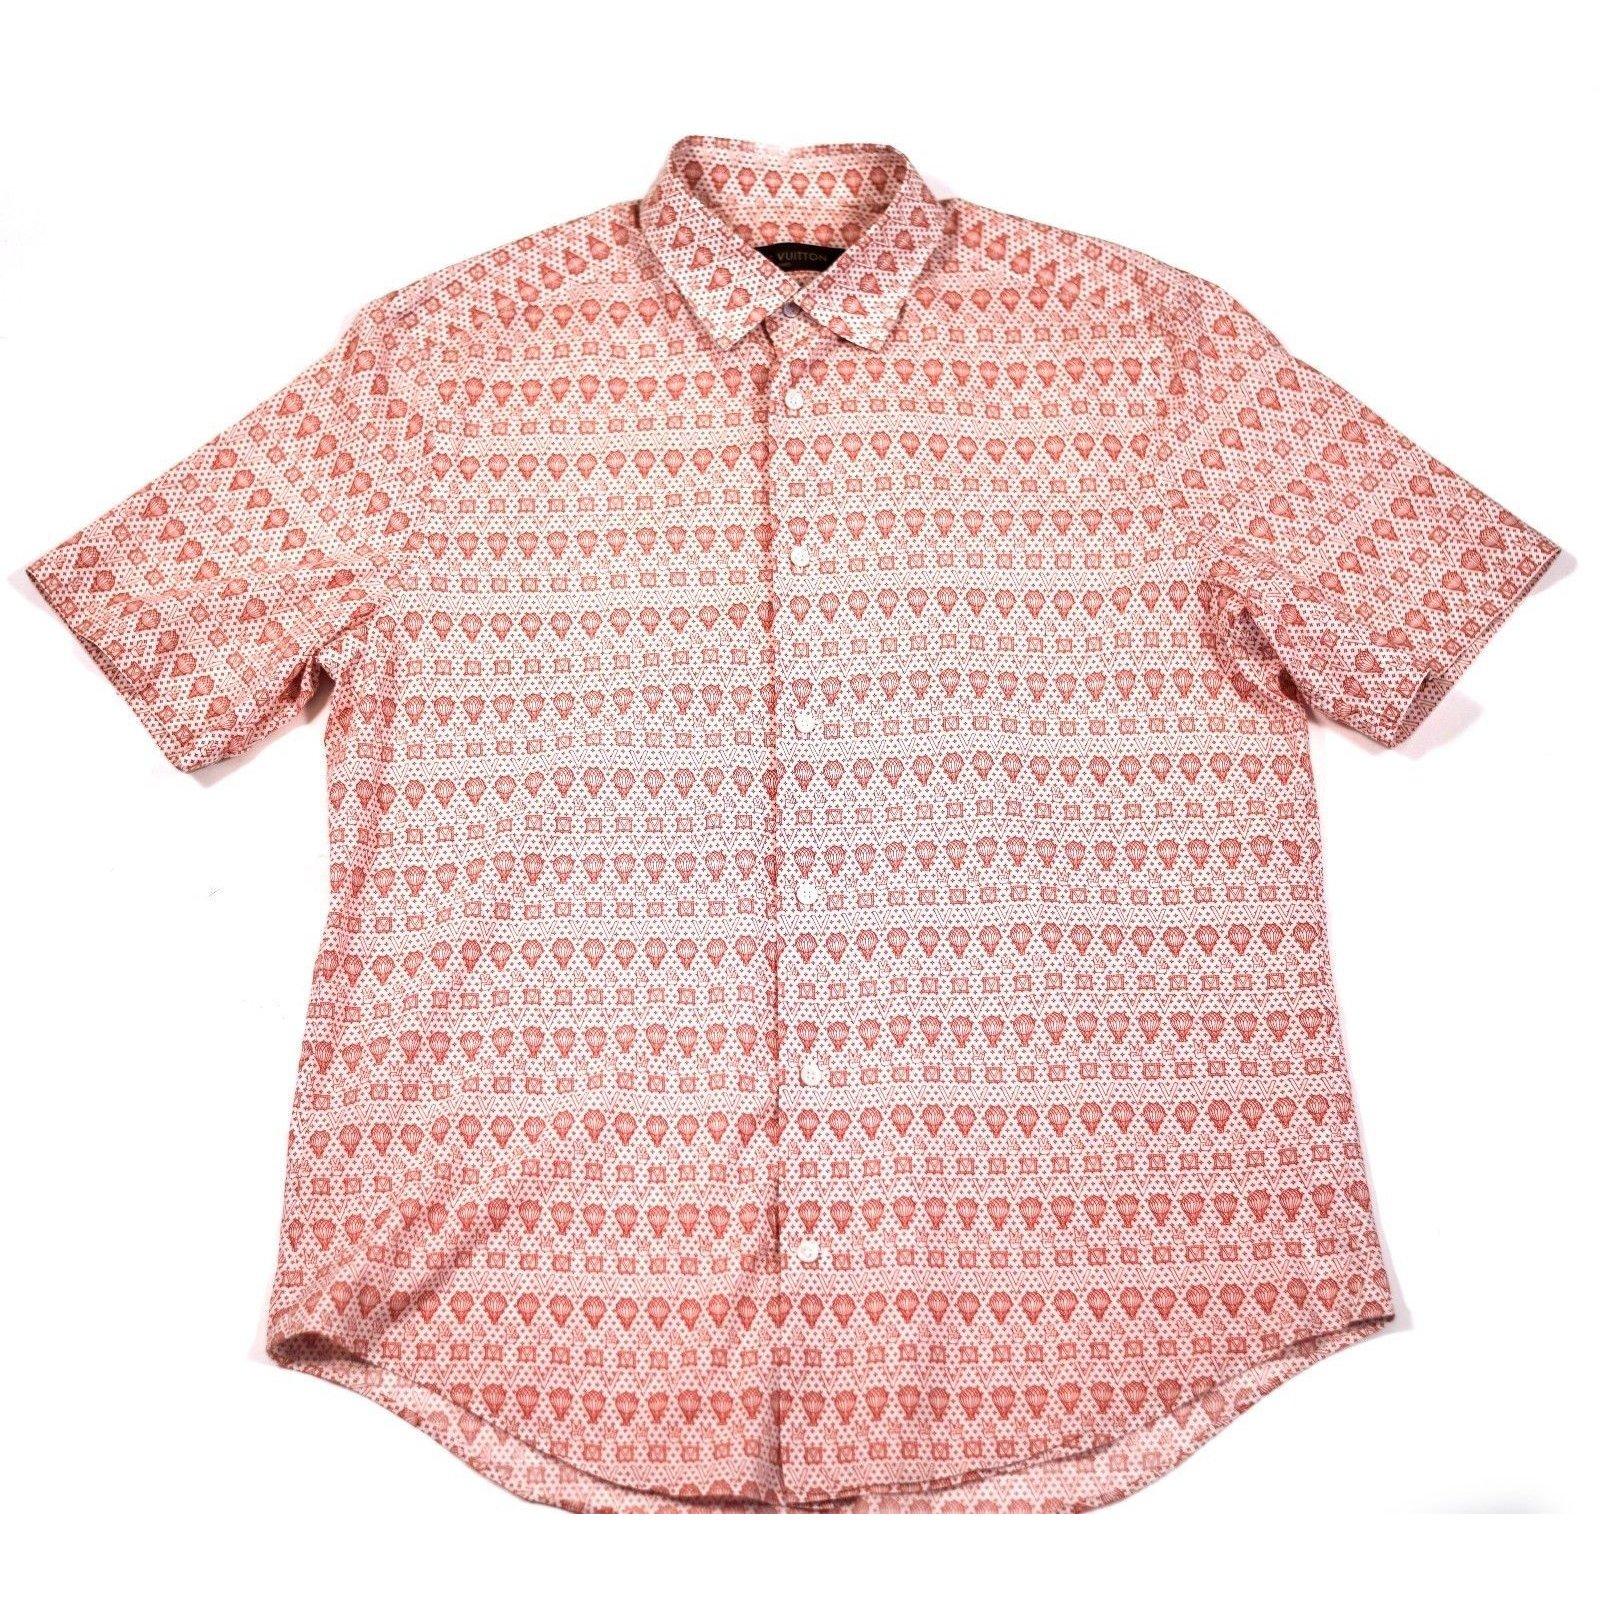 Louis vuitton button up shirt shirts cotton red for Cotton button up shirt